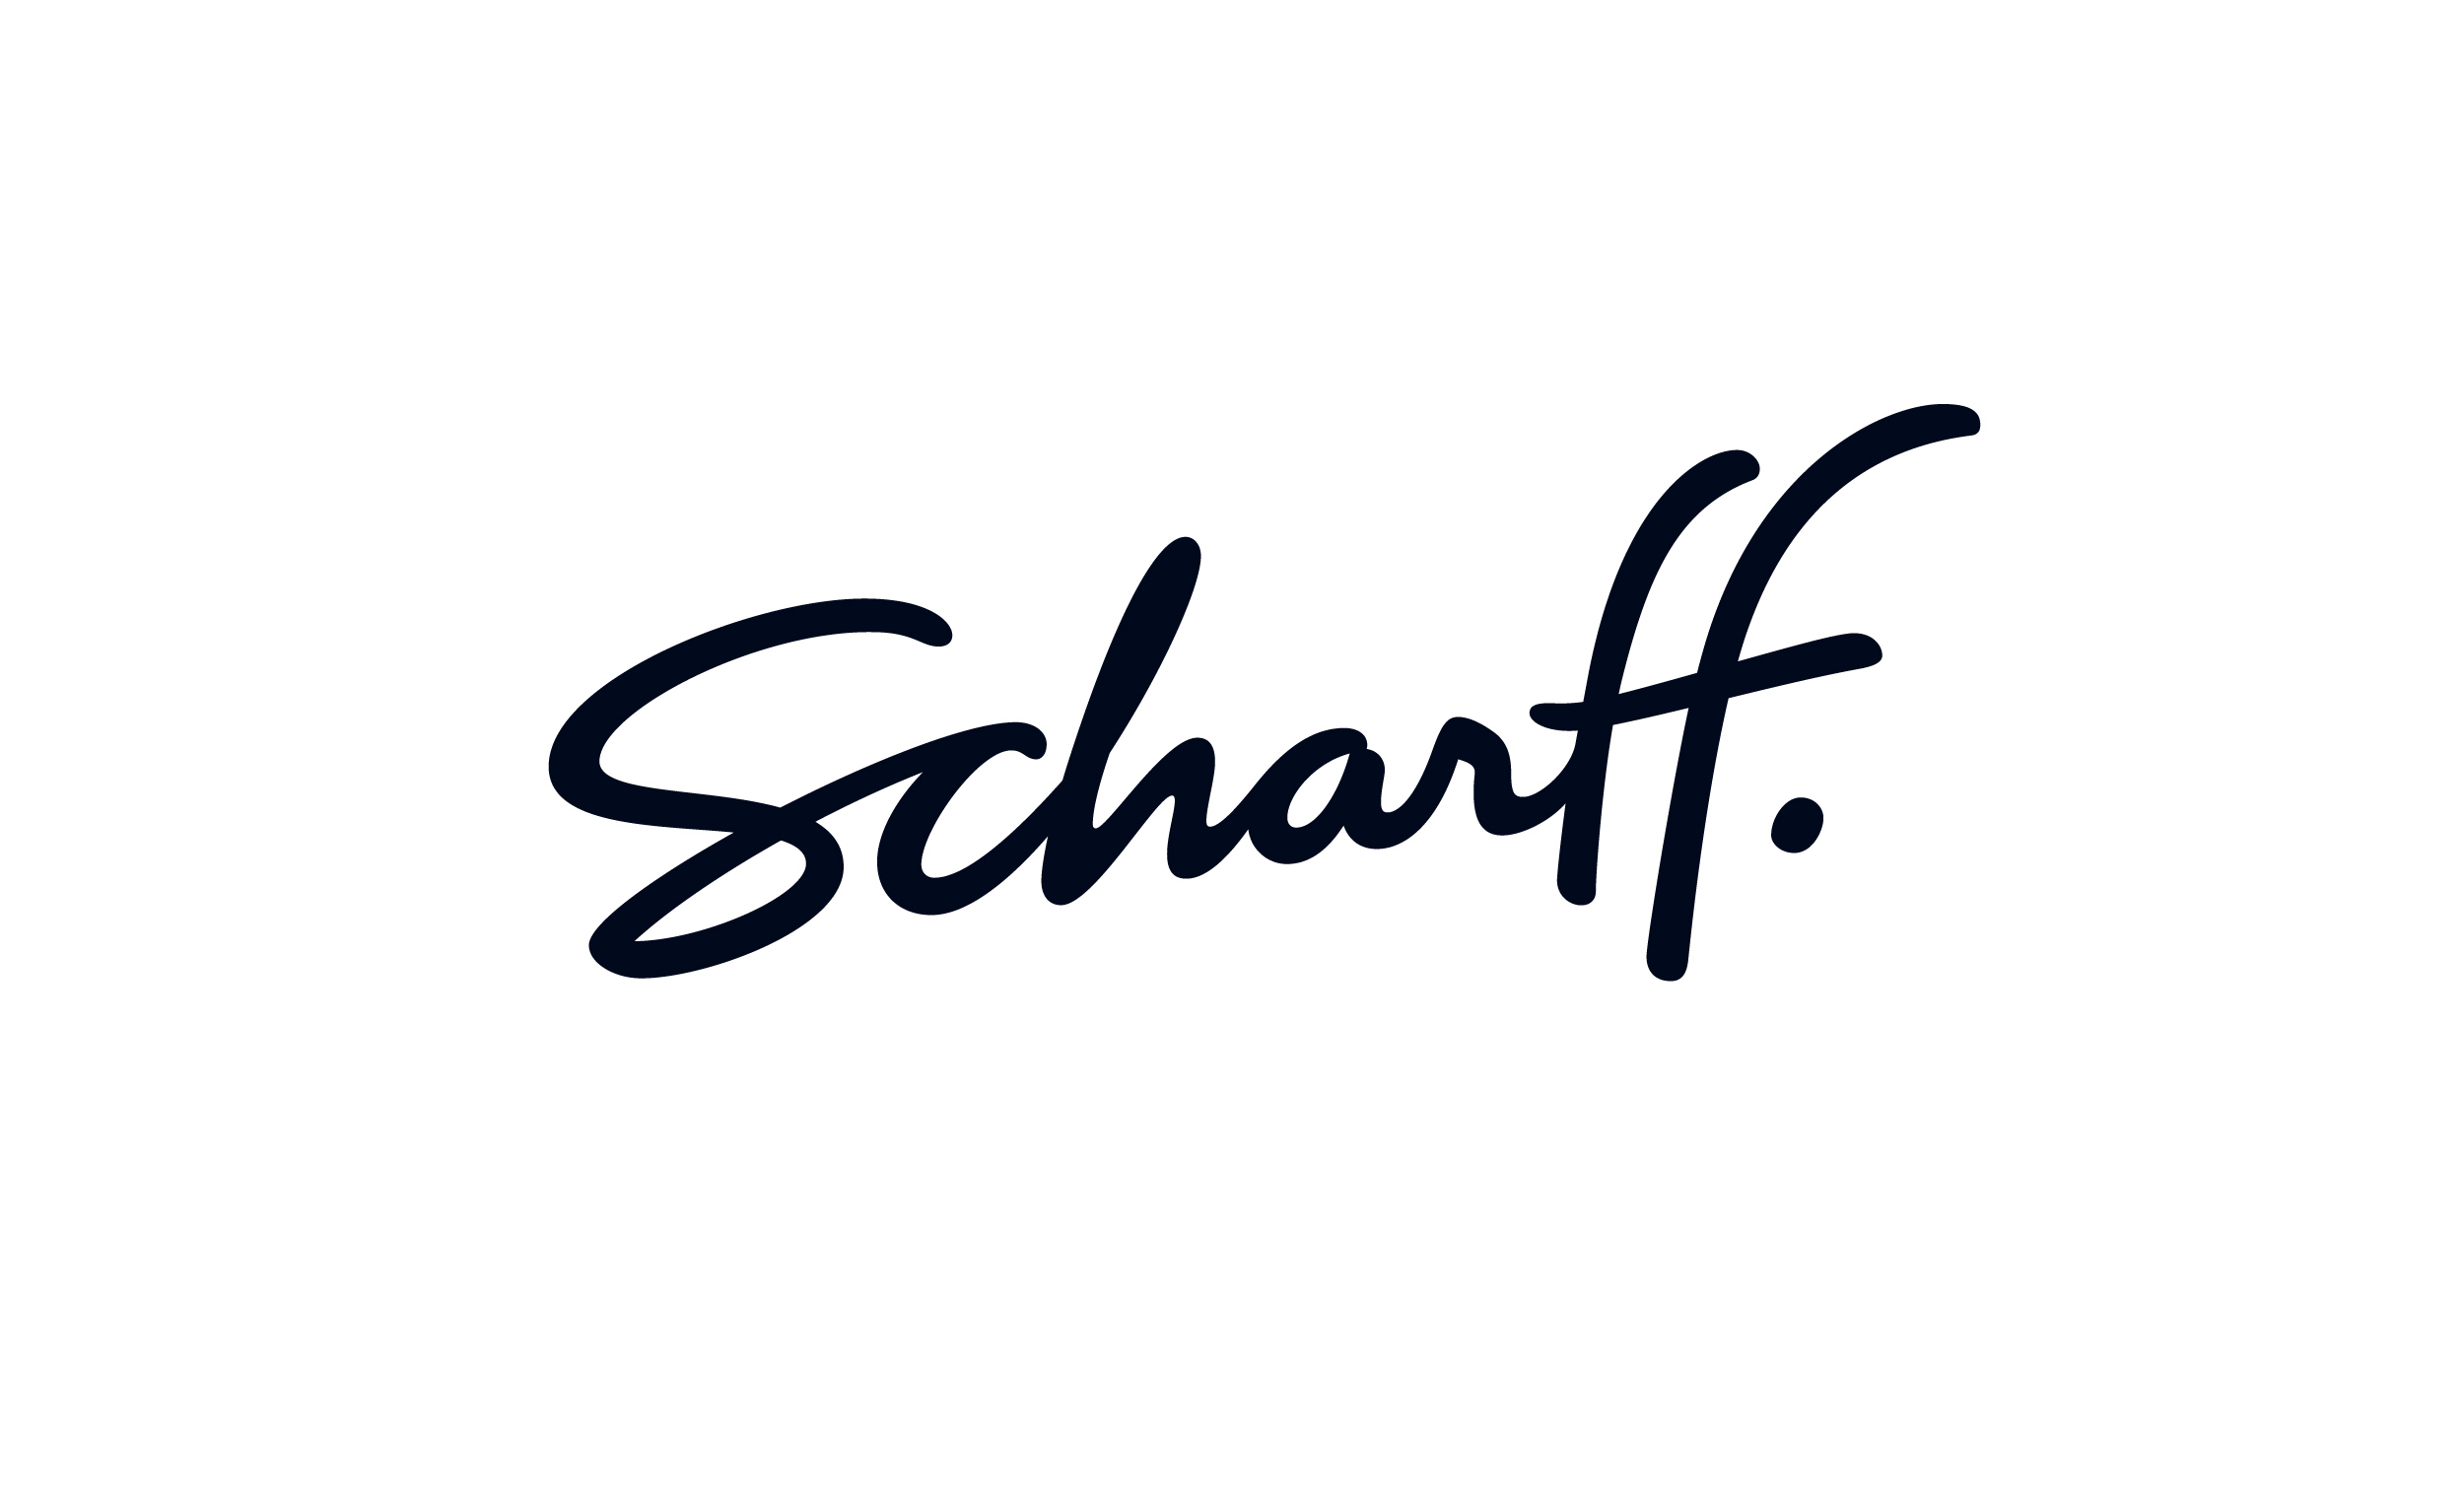 SCHARFF_logo_by_Yanina-Arabena_Guillermo-Vizzari_01